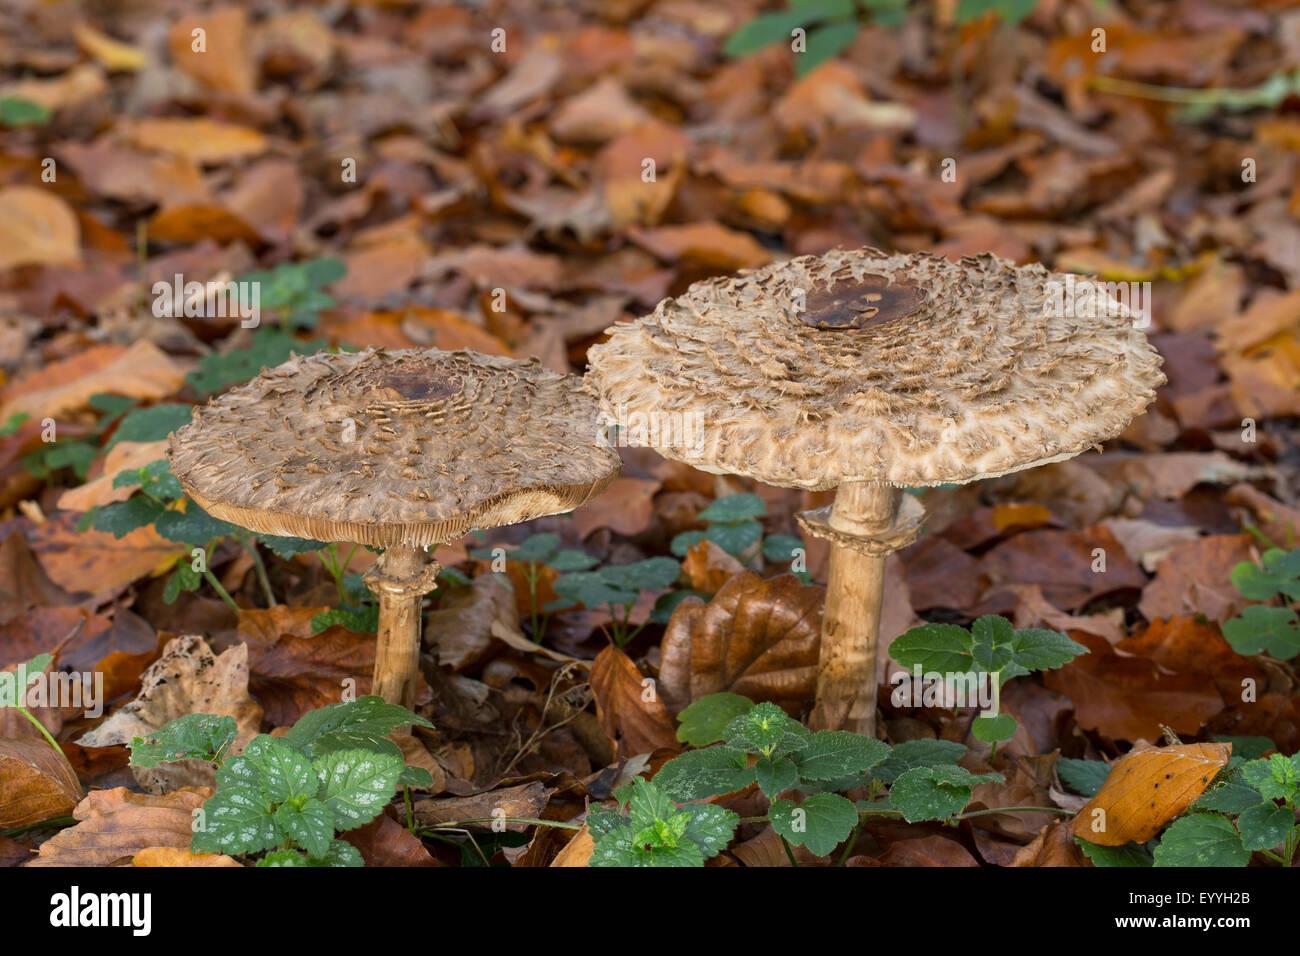 Shaggy parasol (Chlorophyllum rachodes, Macrolepiota rachodes, Chlorophyllum racodes, Macrolepiota racodes), in - Stock Image